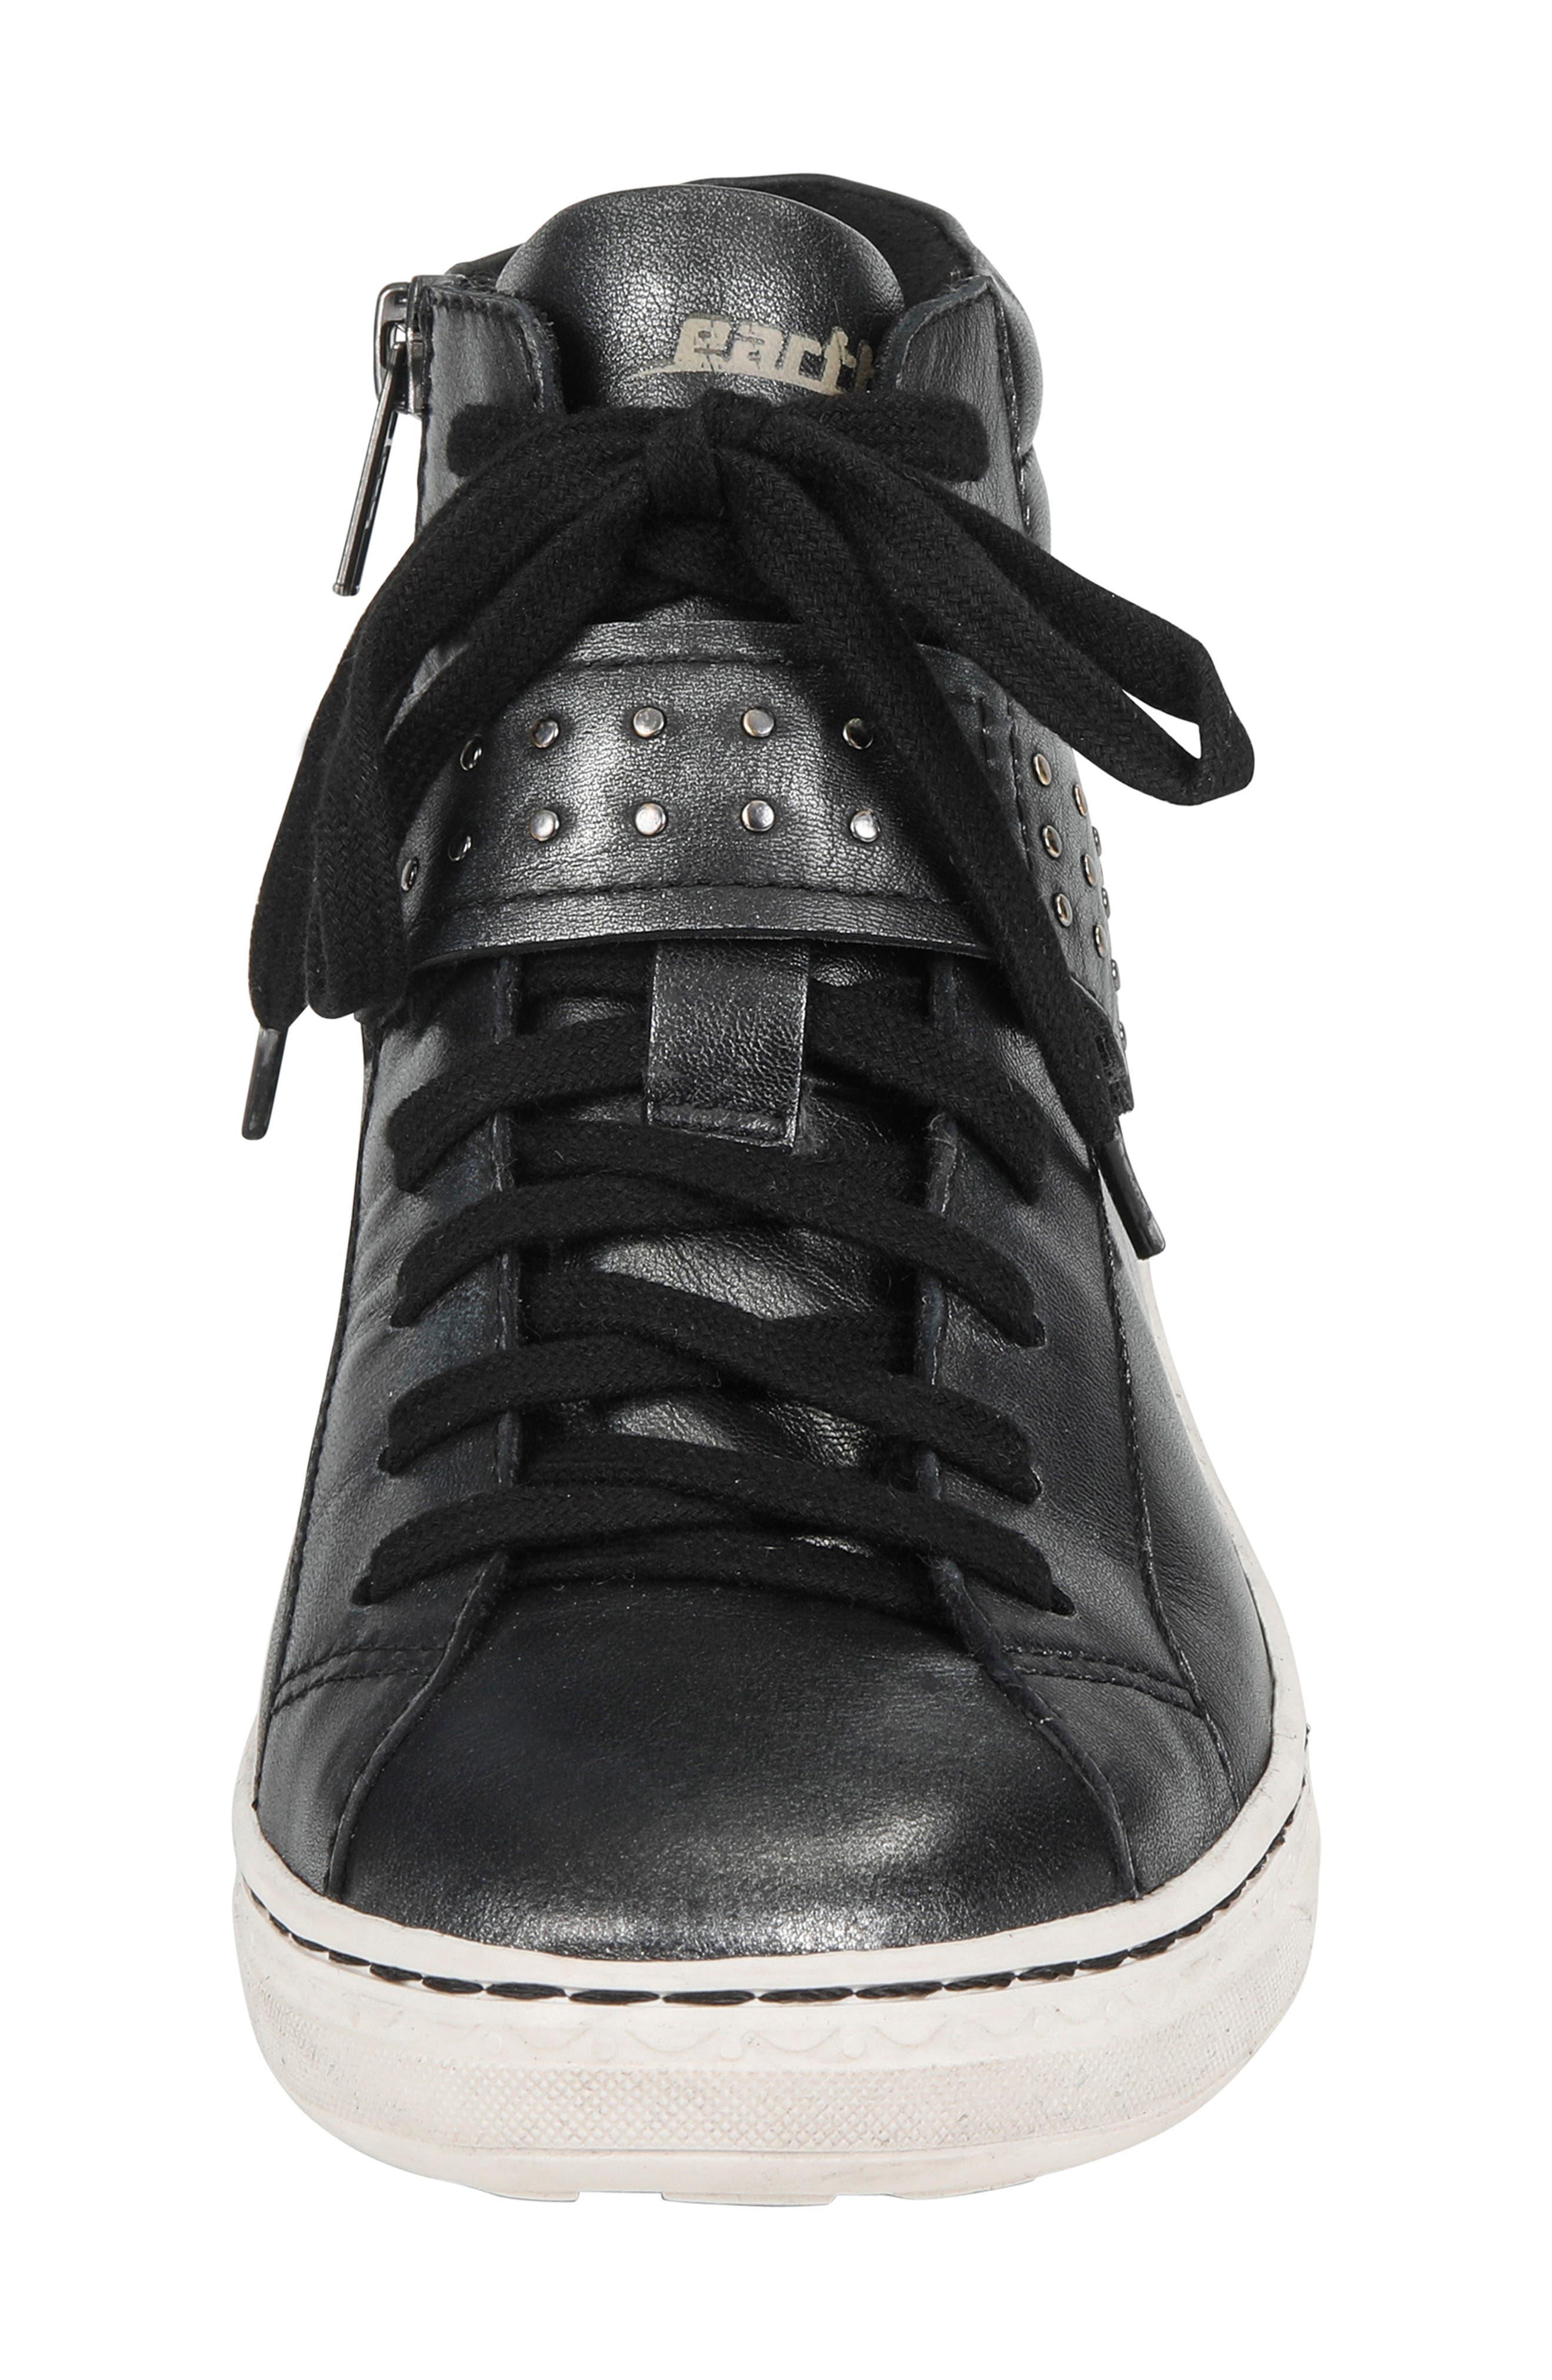 Zeal High Top Sneaker,                             Alternate thumbnail 4, color,                             BLACK METALLIC LEATHER